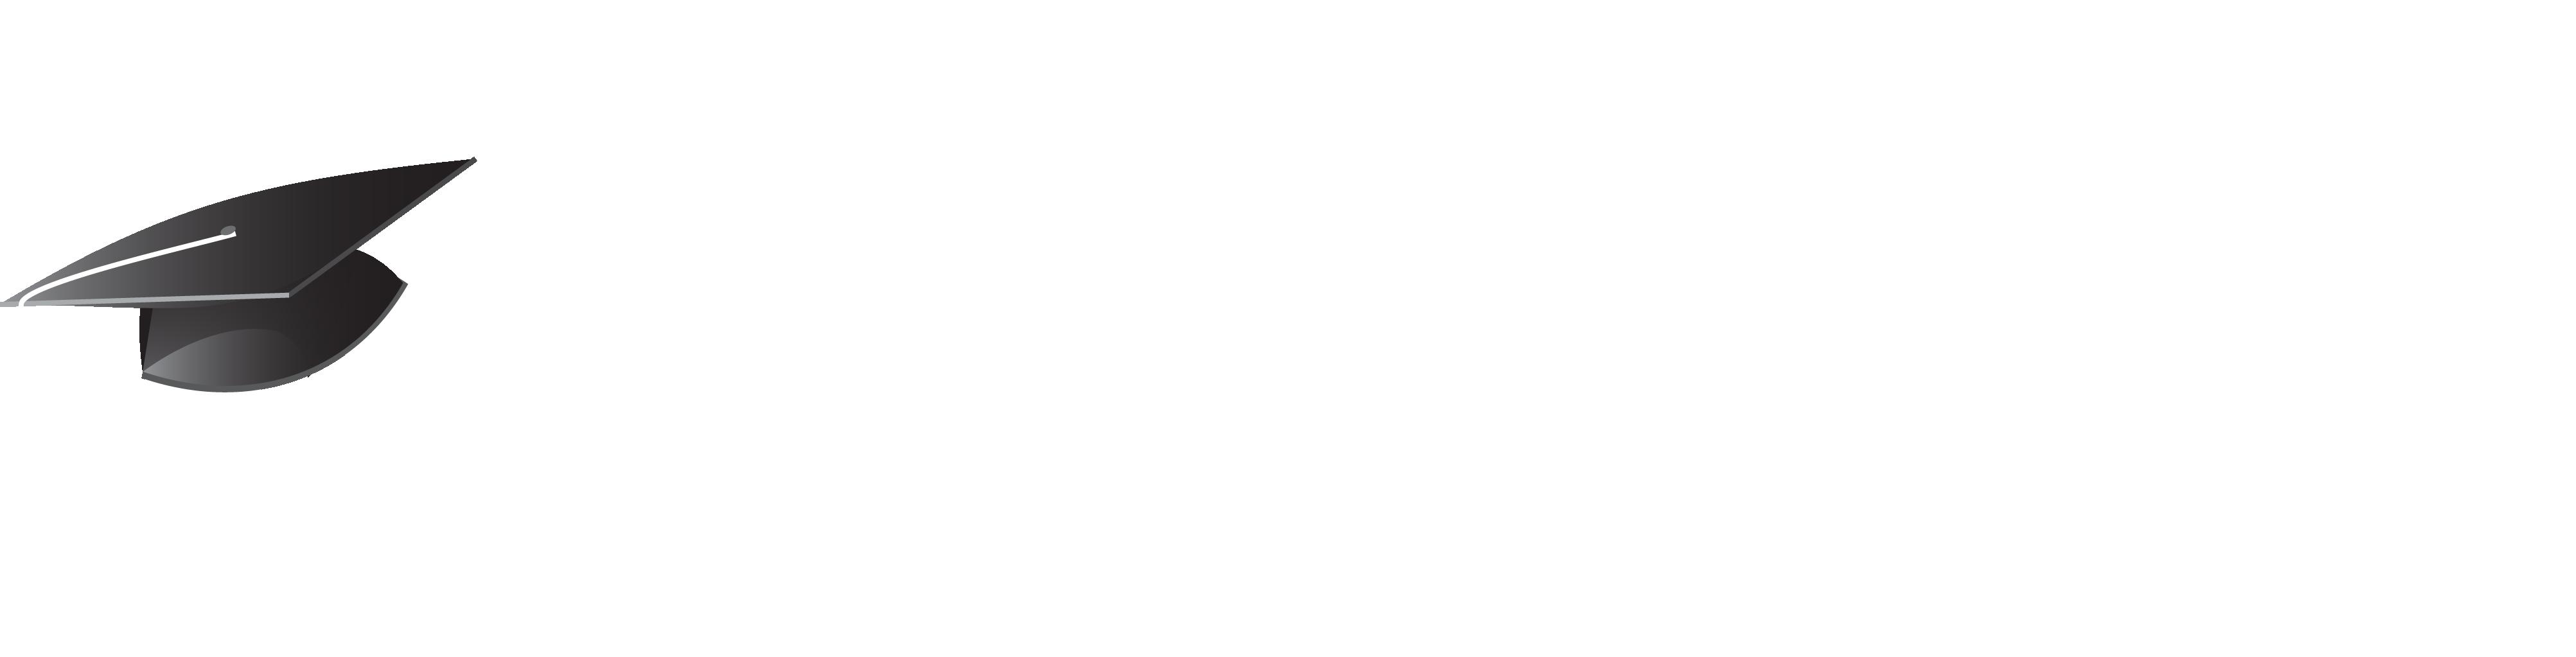 Moodle logo